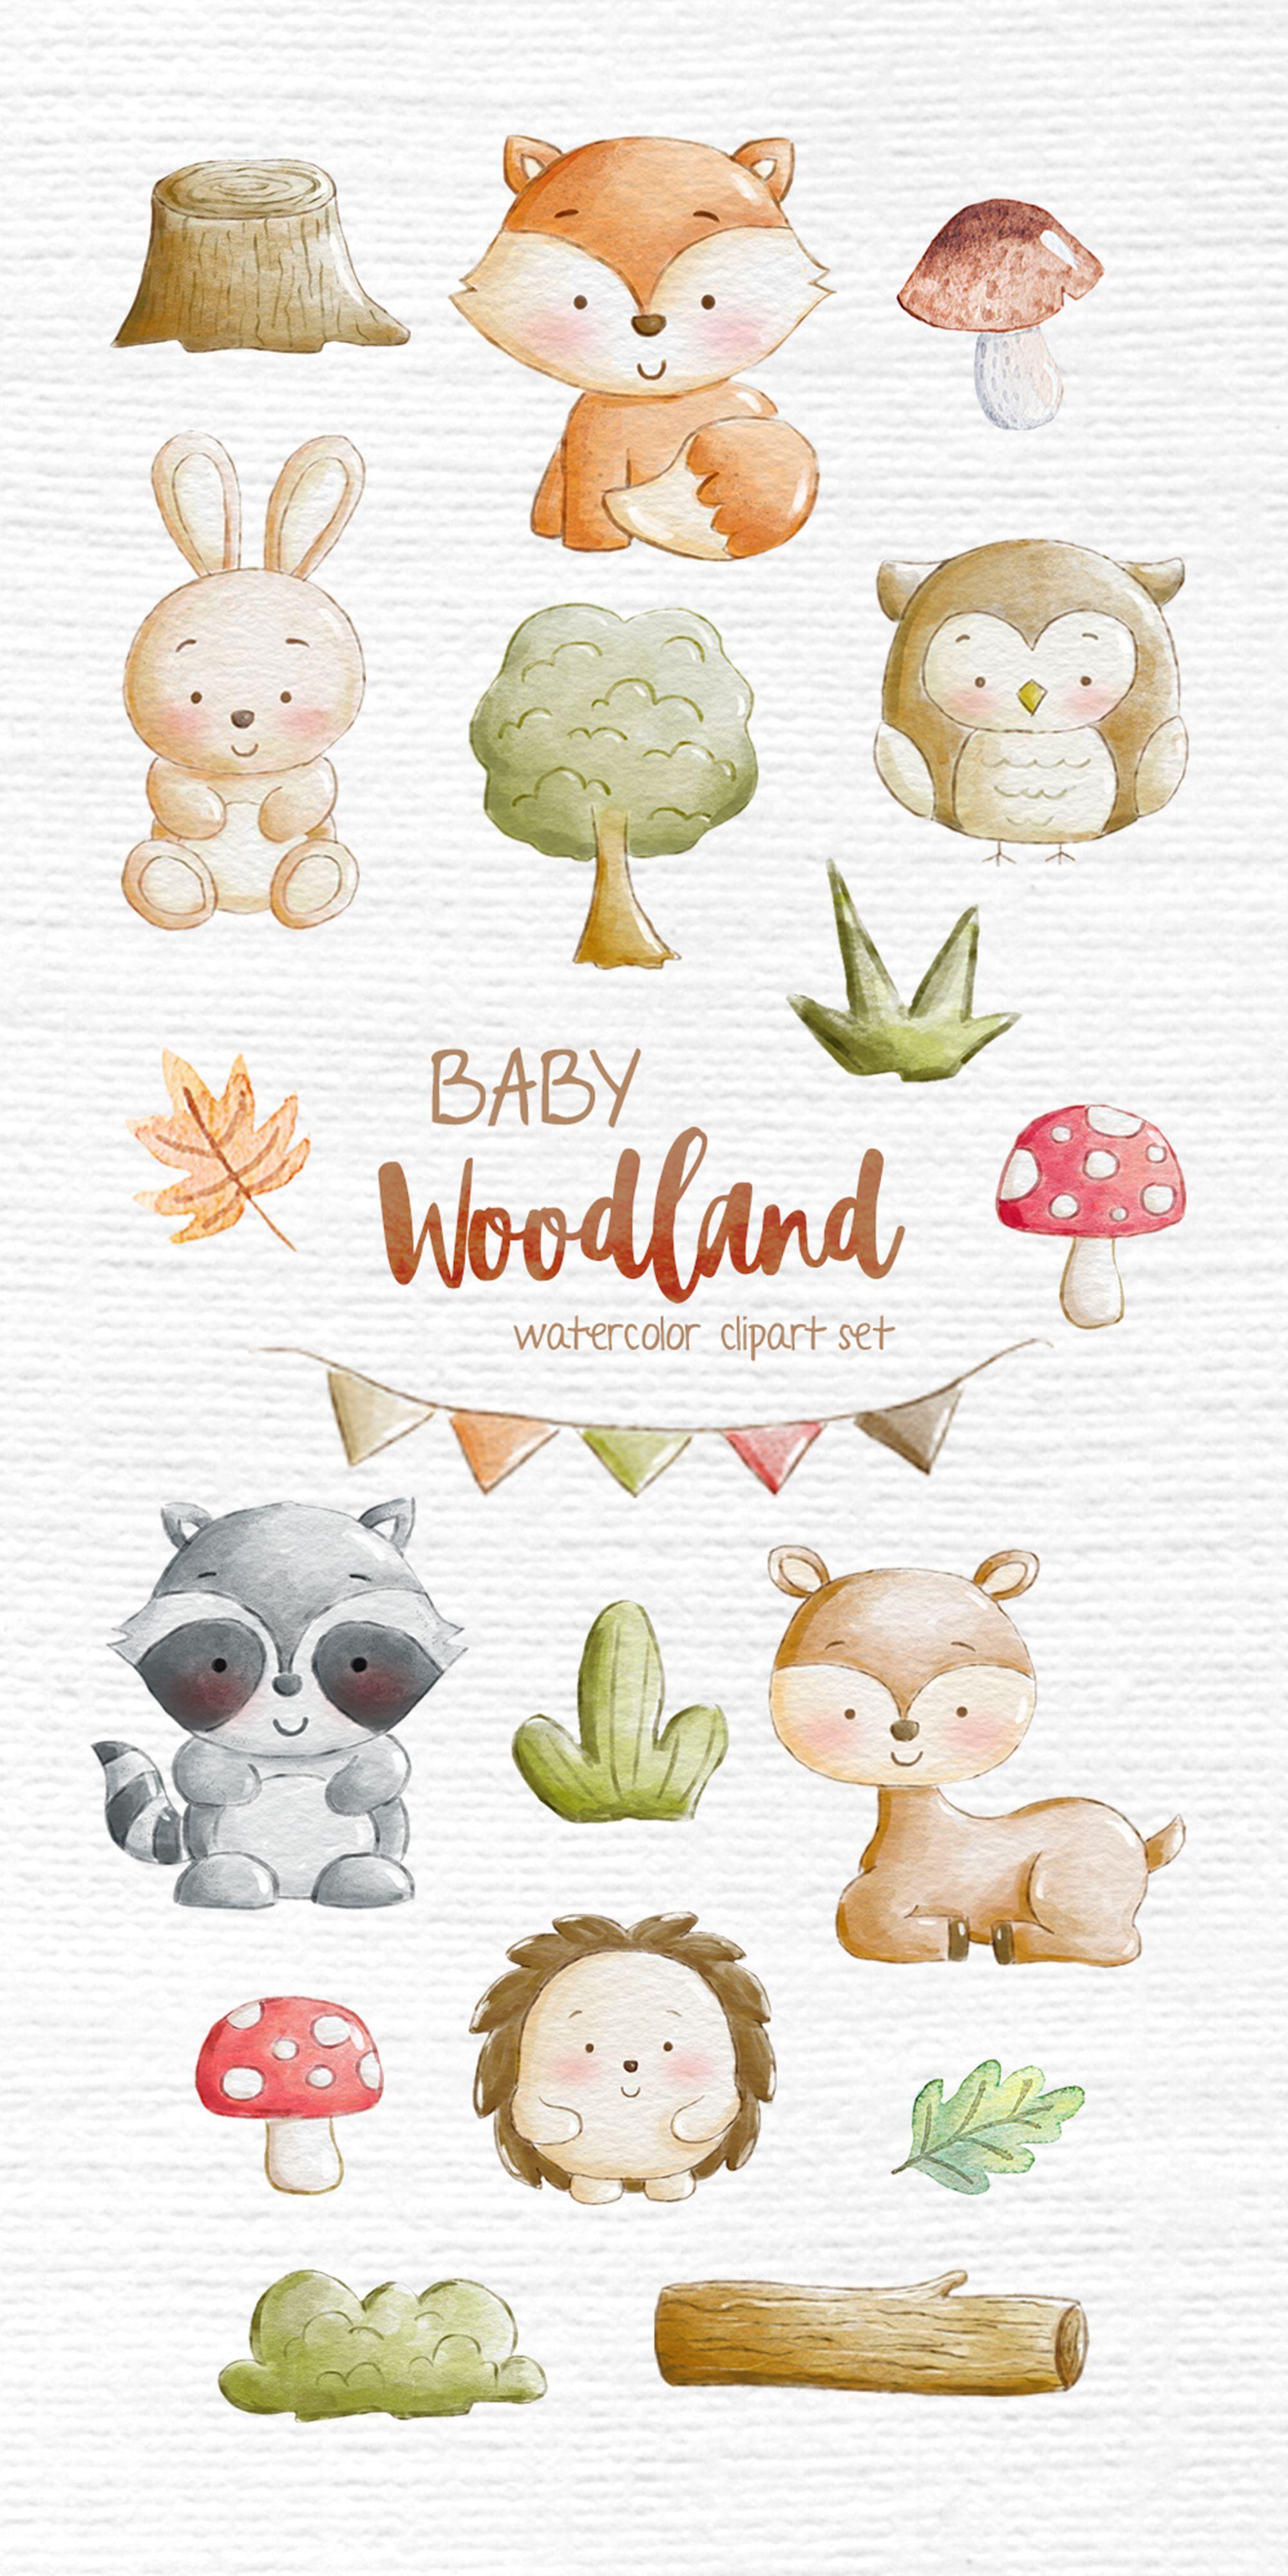 Woodland Animal Illustration Watercolor Clipart Nursery Forest Etsy Baby Art Animal Illustration Baby Illustration